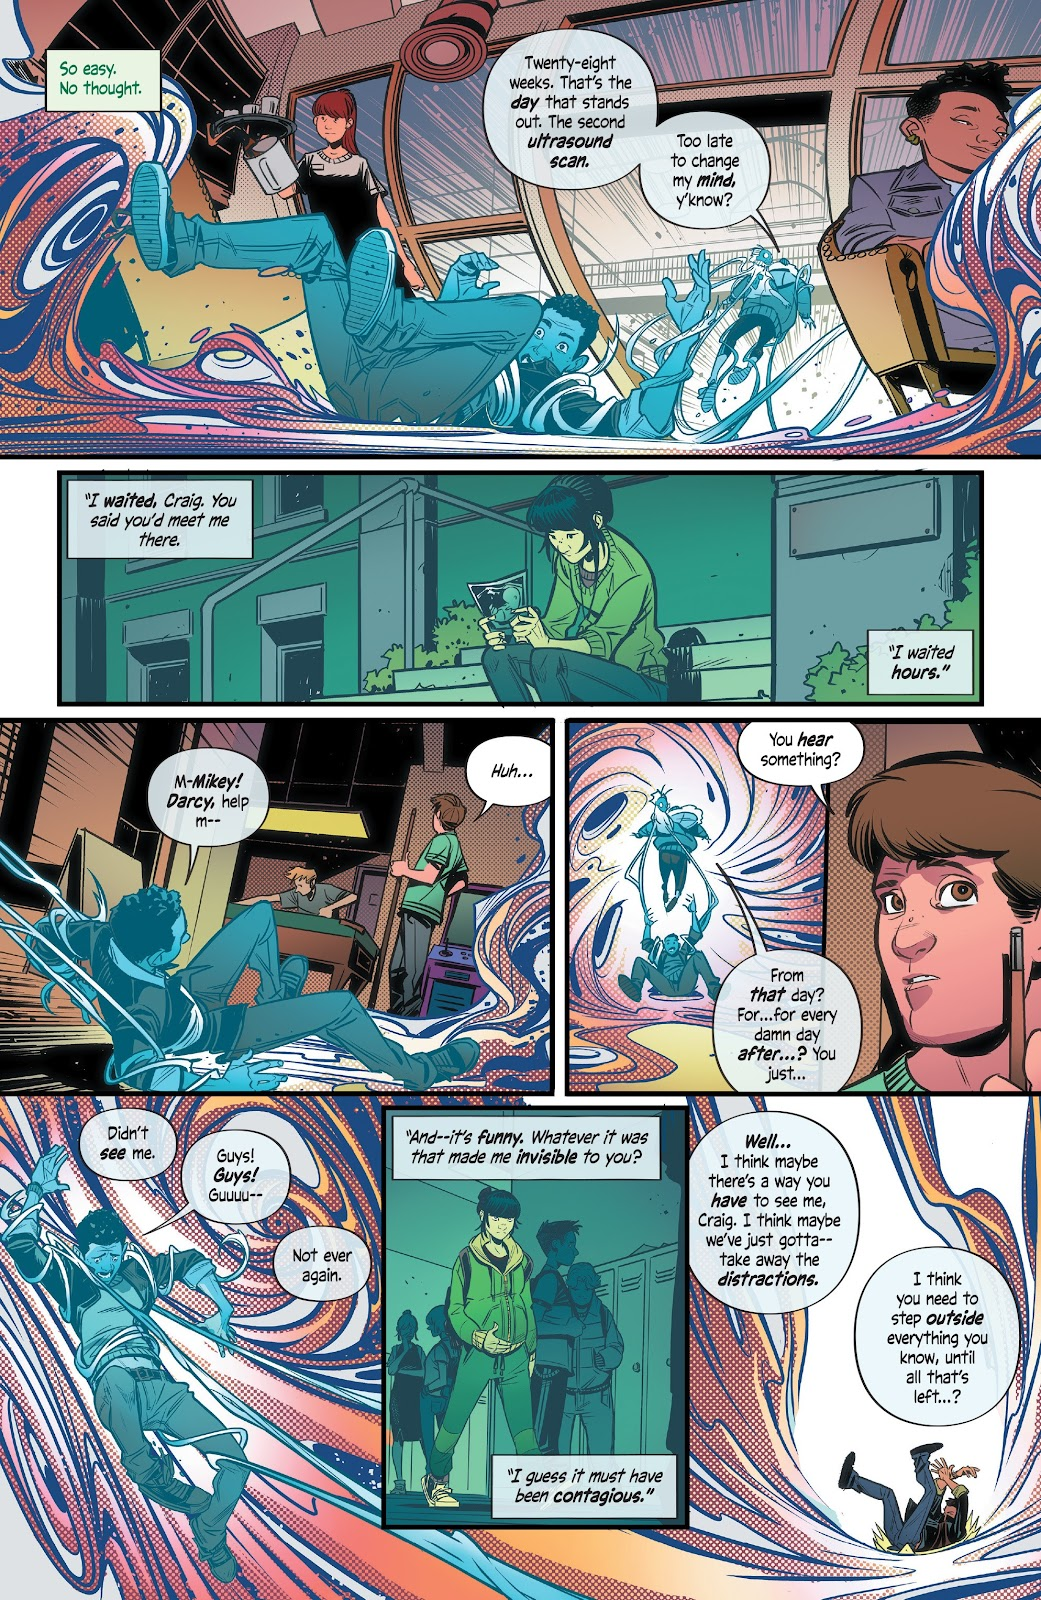 Read online Alienated comic -  Issue #3 - 11